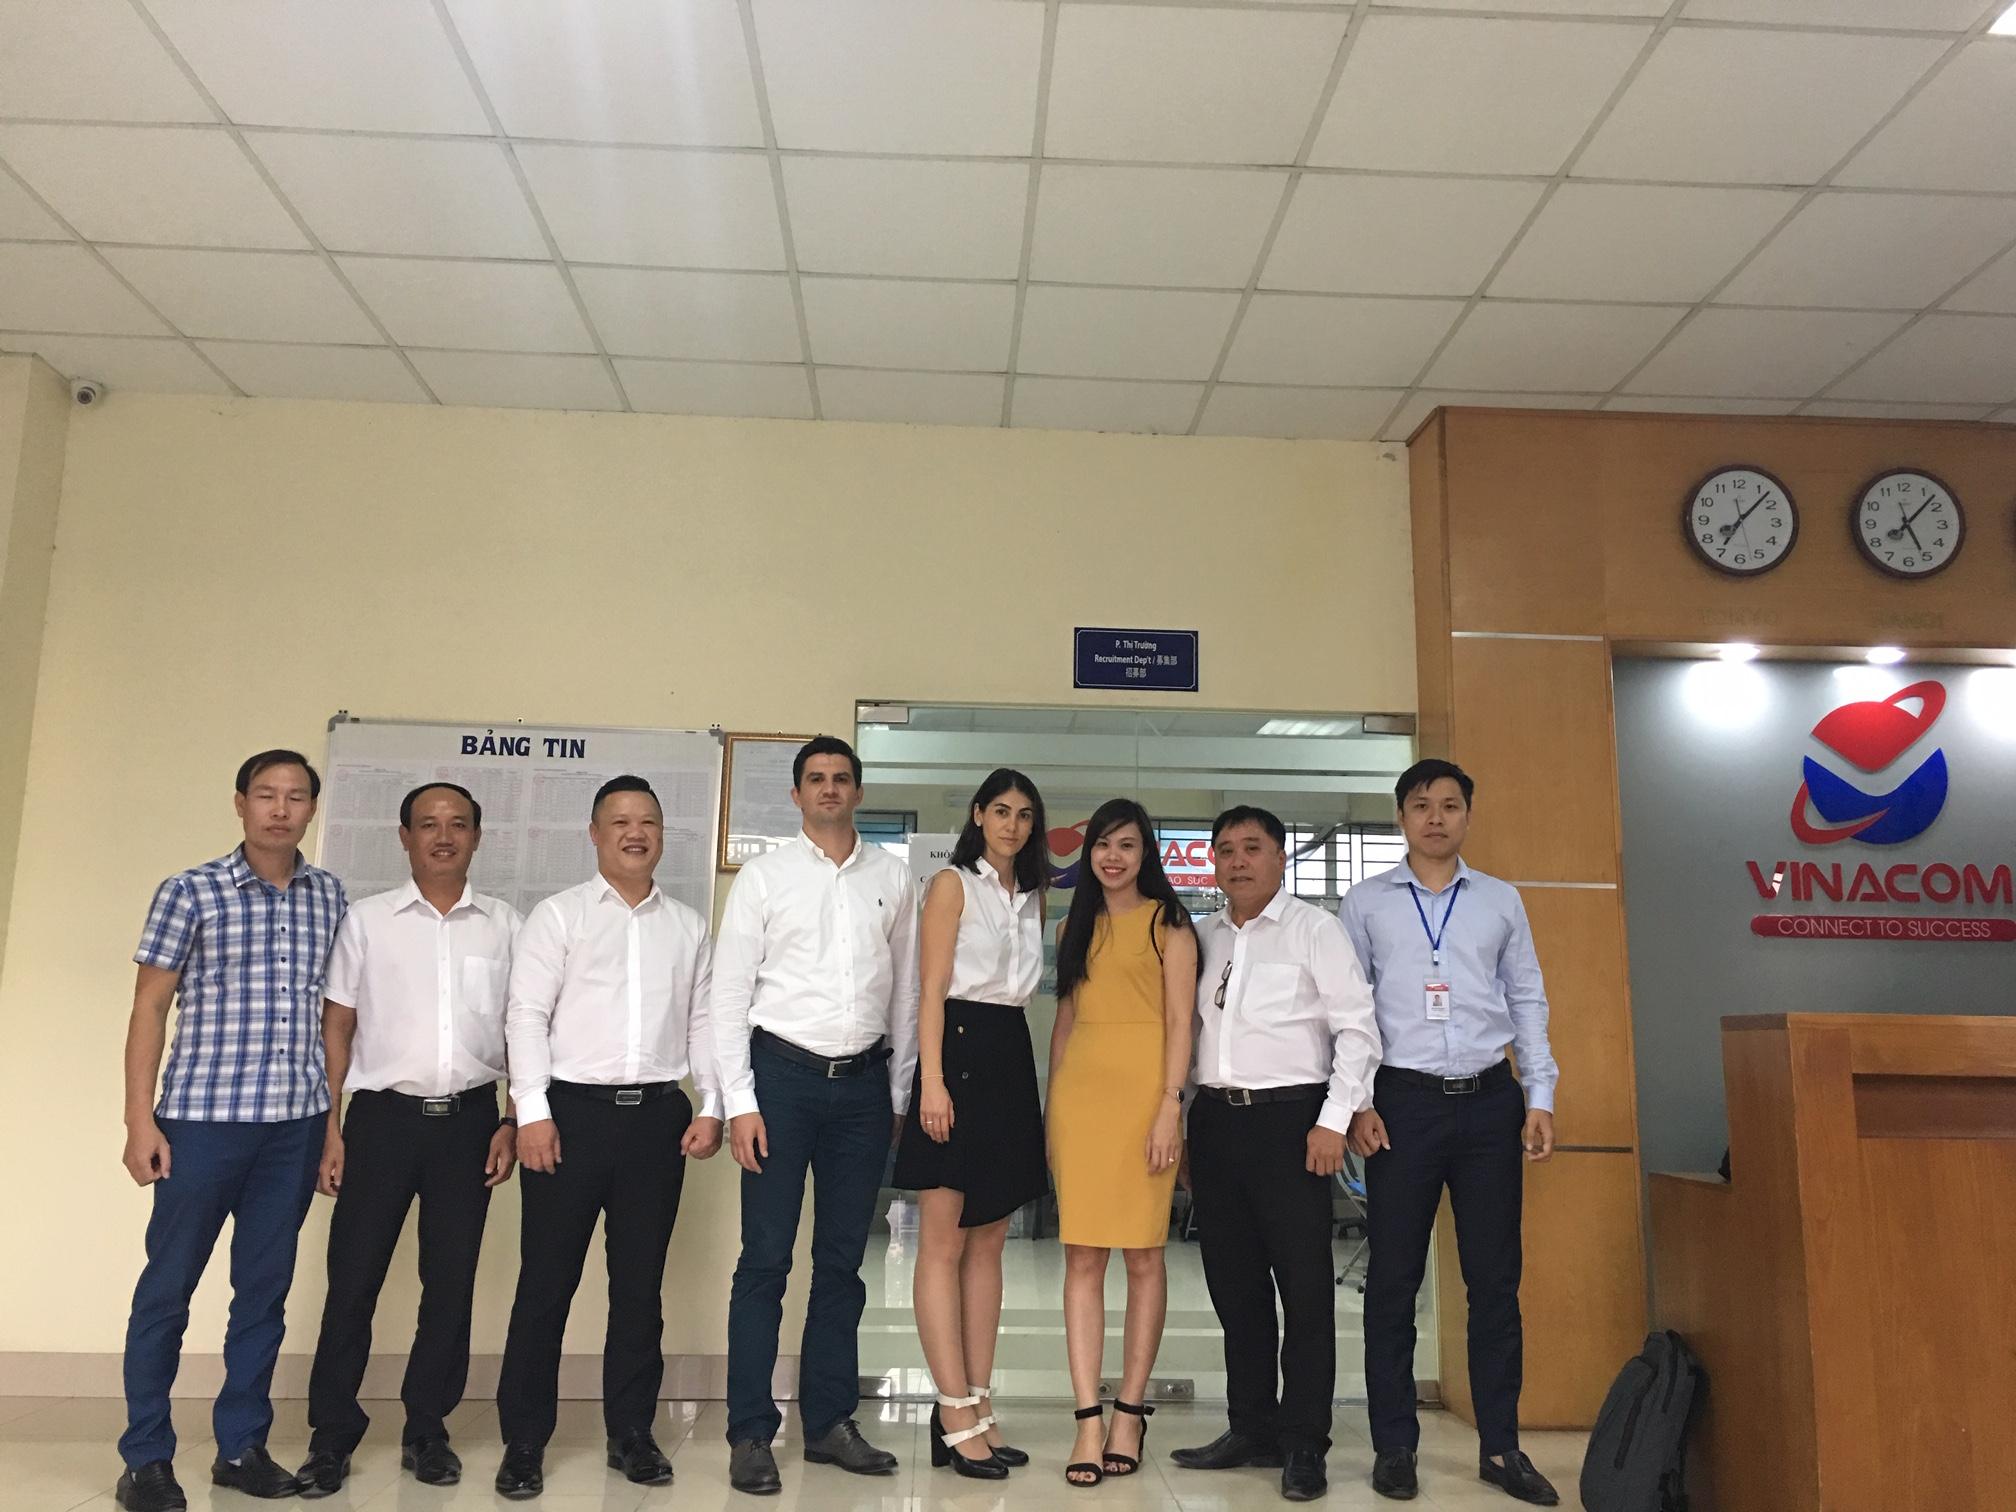 Am fost in Vietnam si Nepal sa cautam personal asiatic - International Work Finder